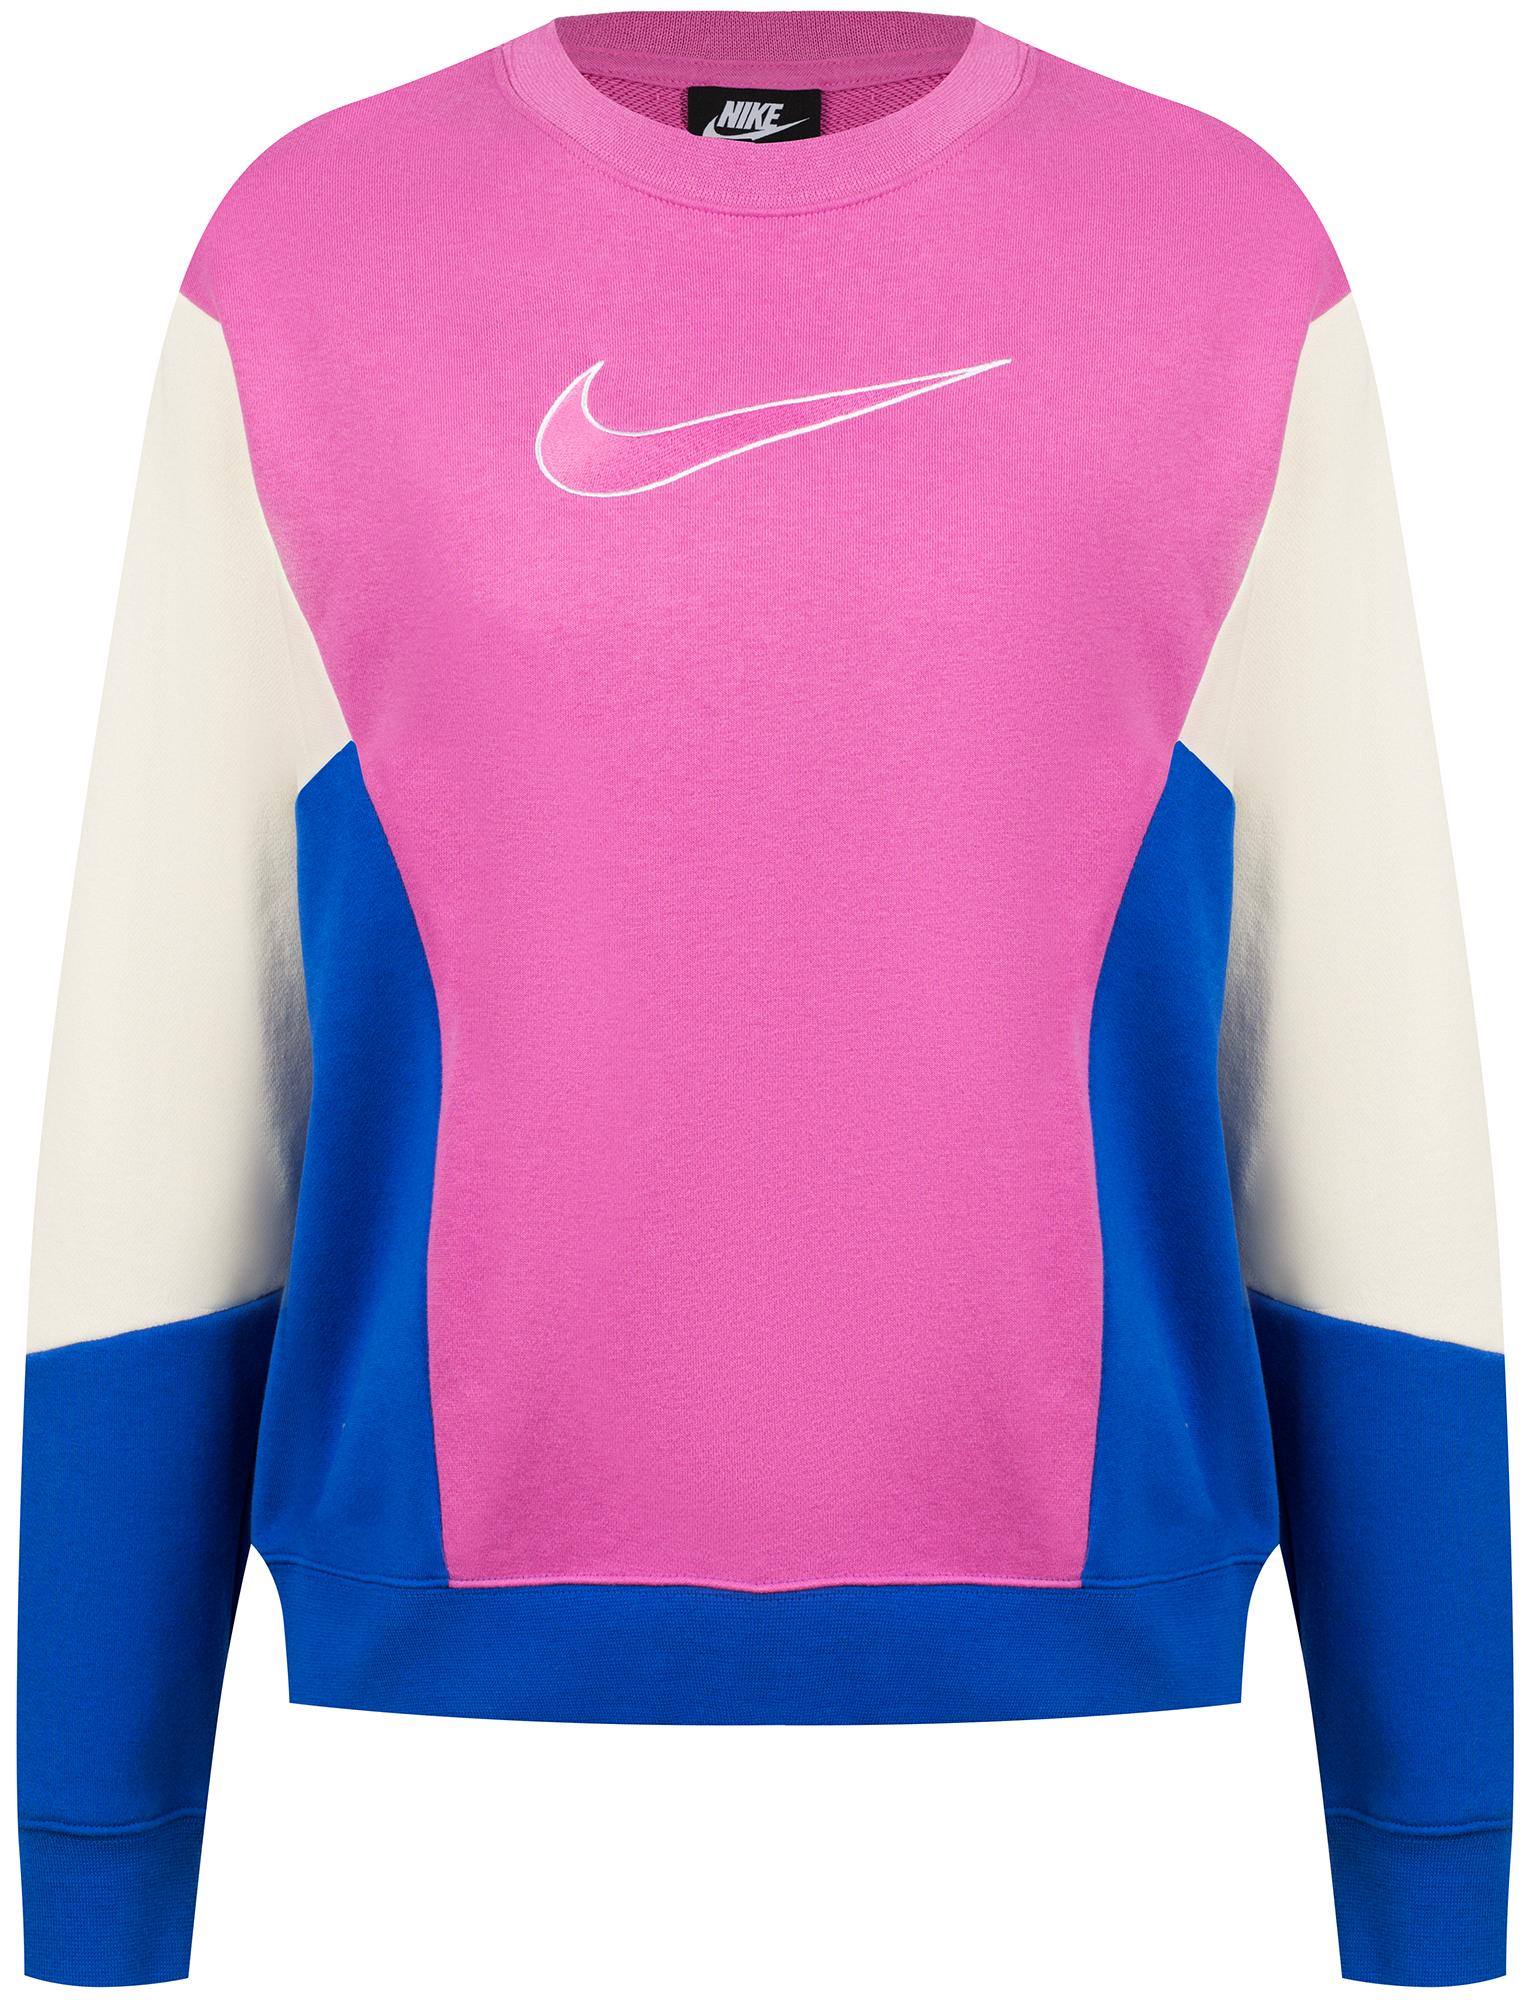 Nike Свитшот женский Sportswear, размер 40-42